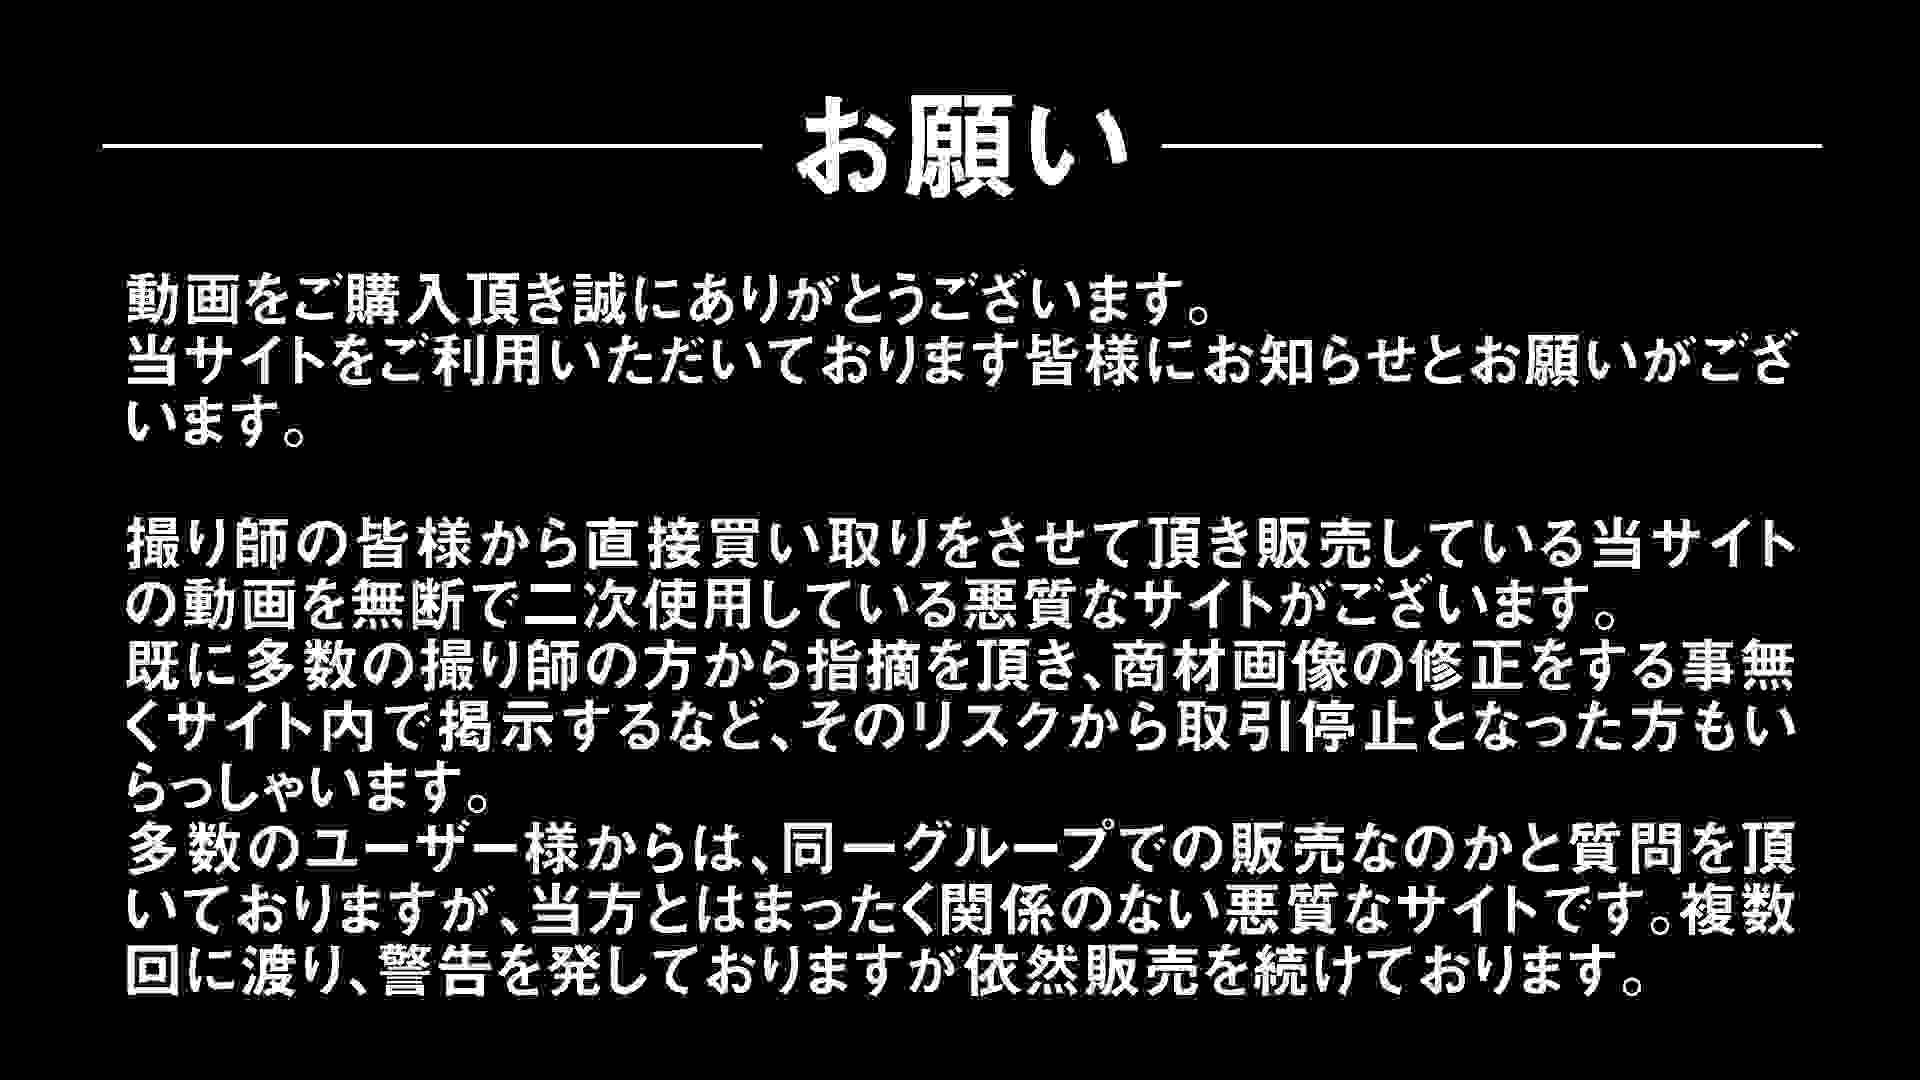 Aquaな露天風呂Vol.296 盗撮シリーズ   露天風呂編  102PIX 1